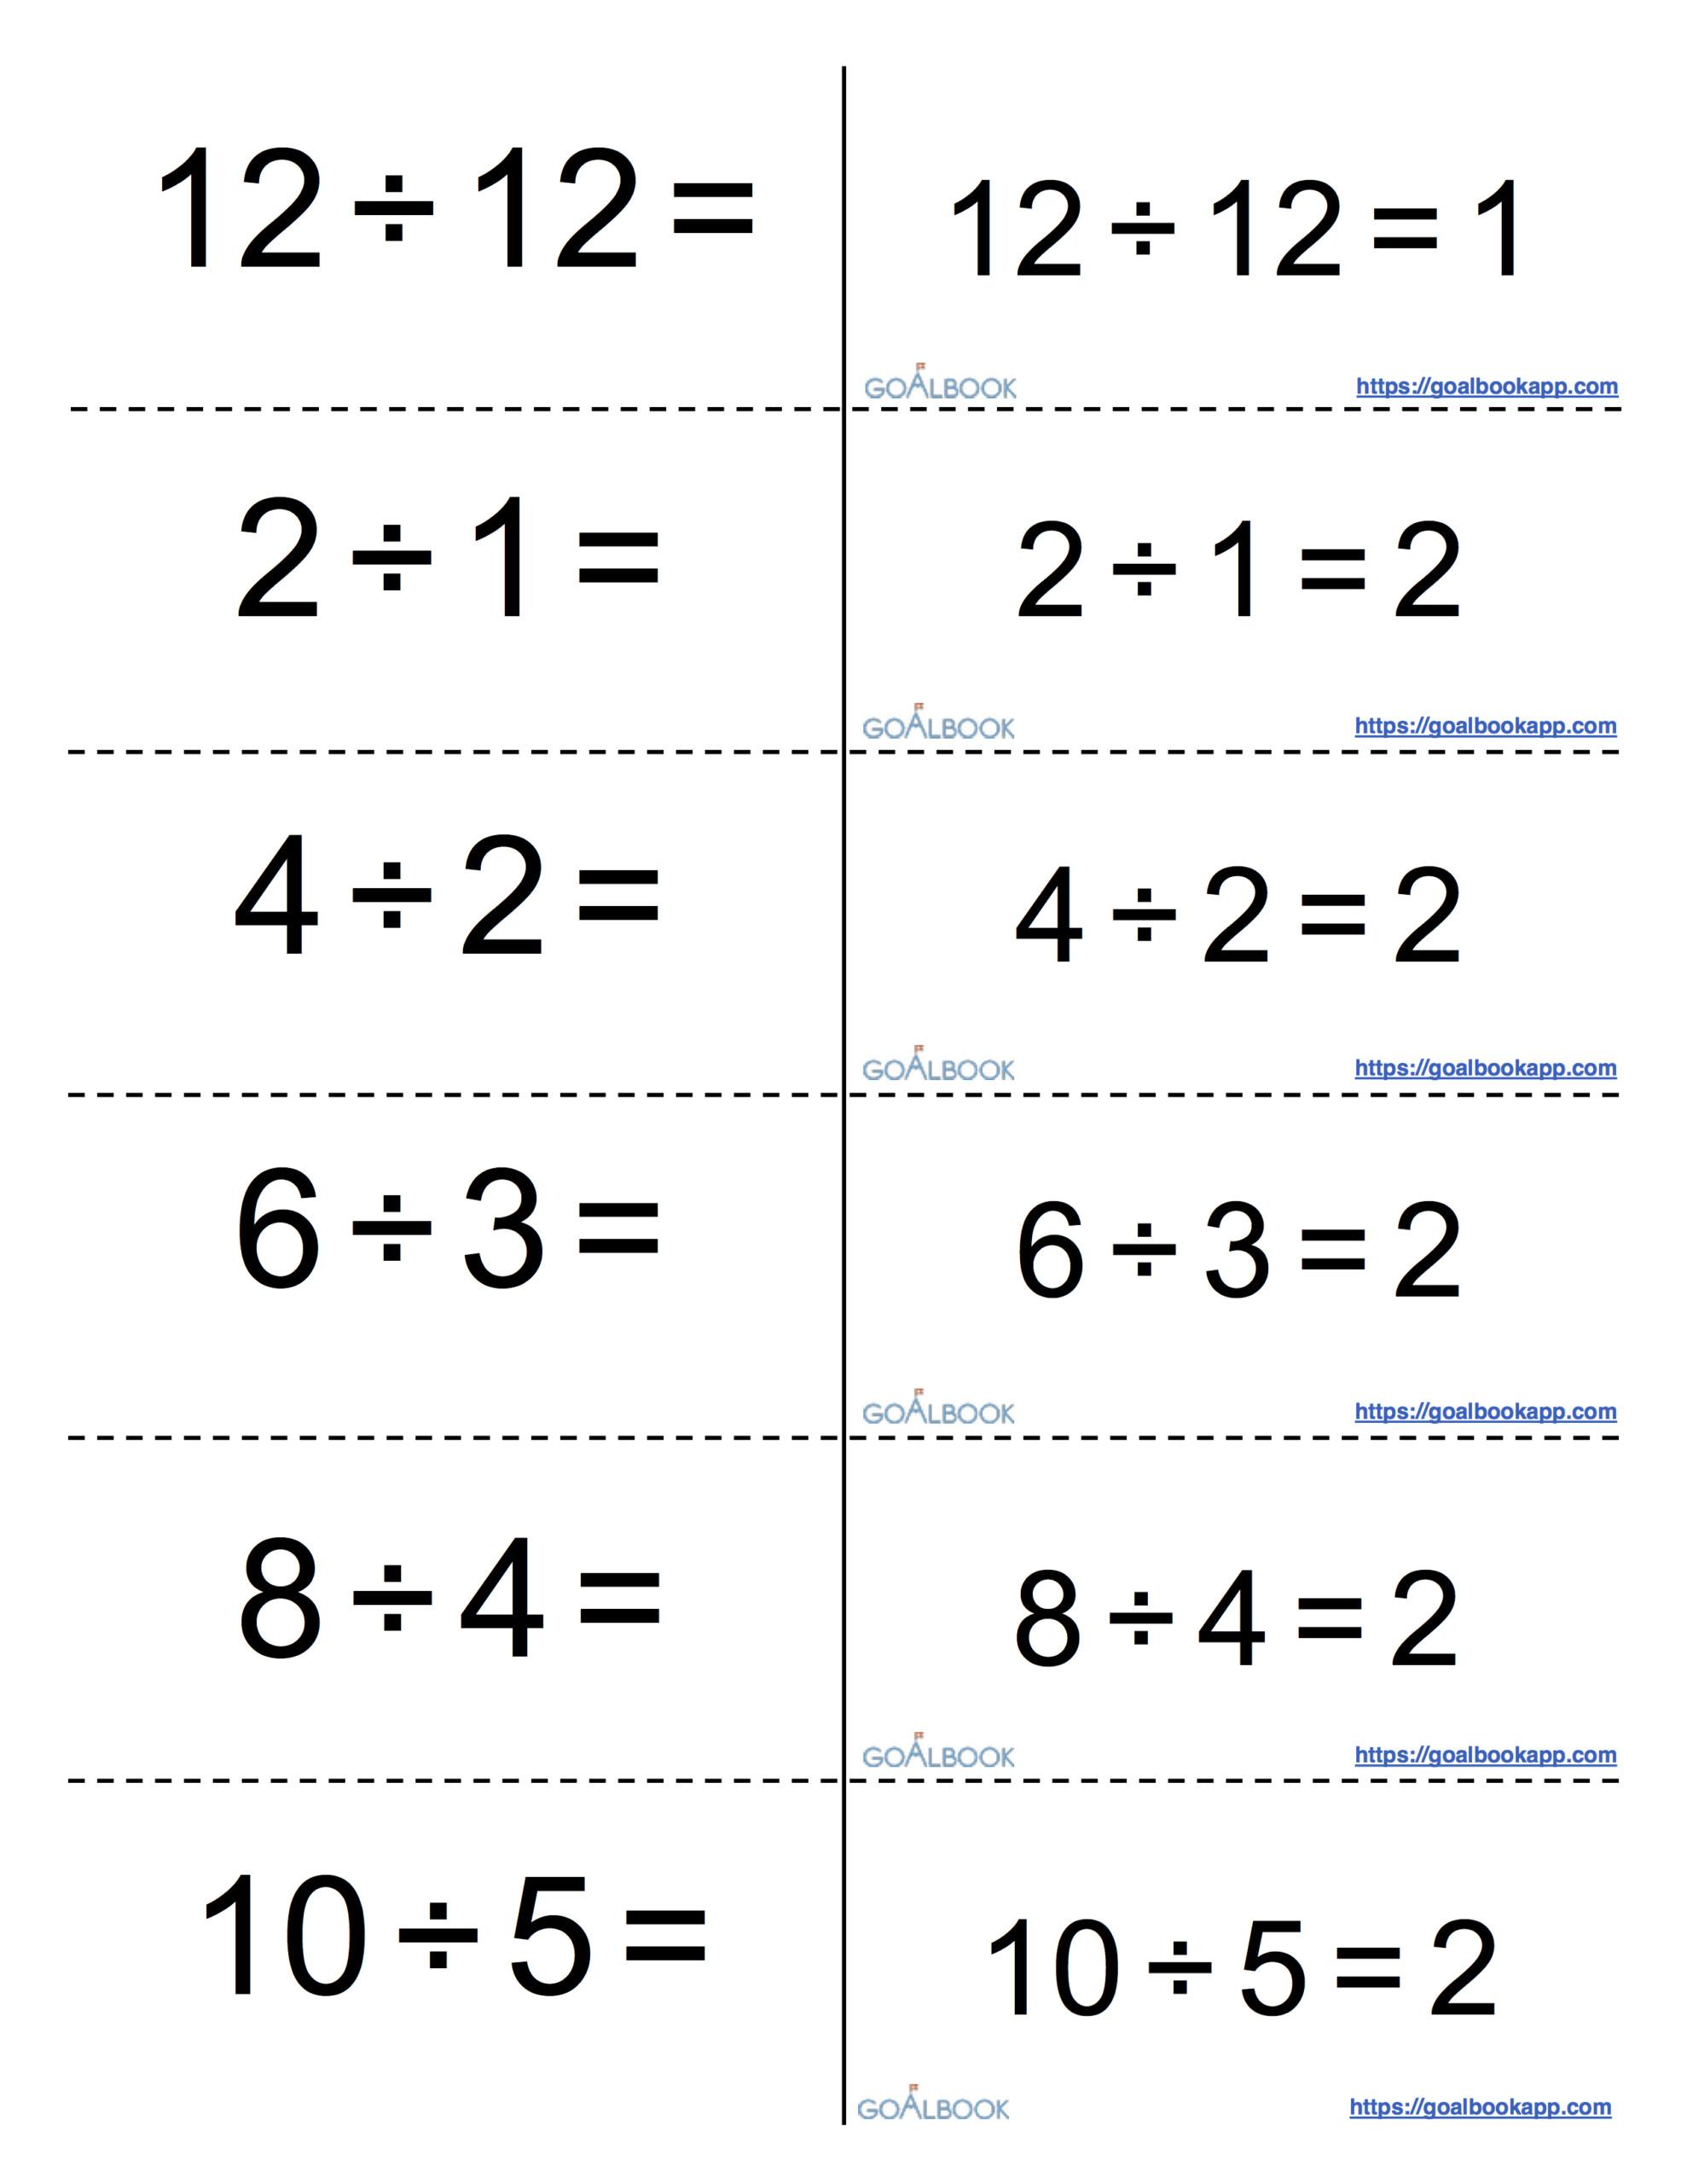 Math Flashcards Worksheet | Printable Worksheets And for Free Printable Horizontal Multiplication Flash Cards